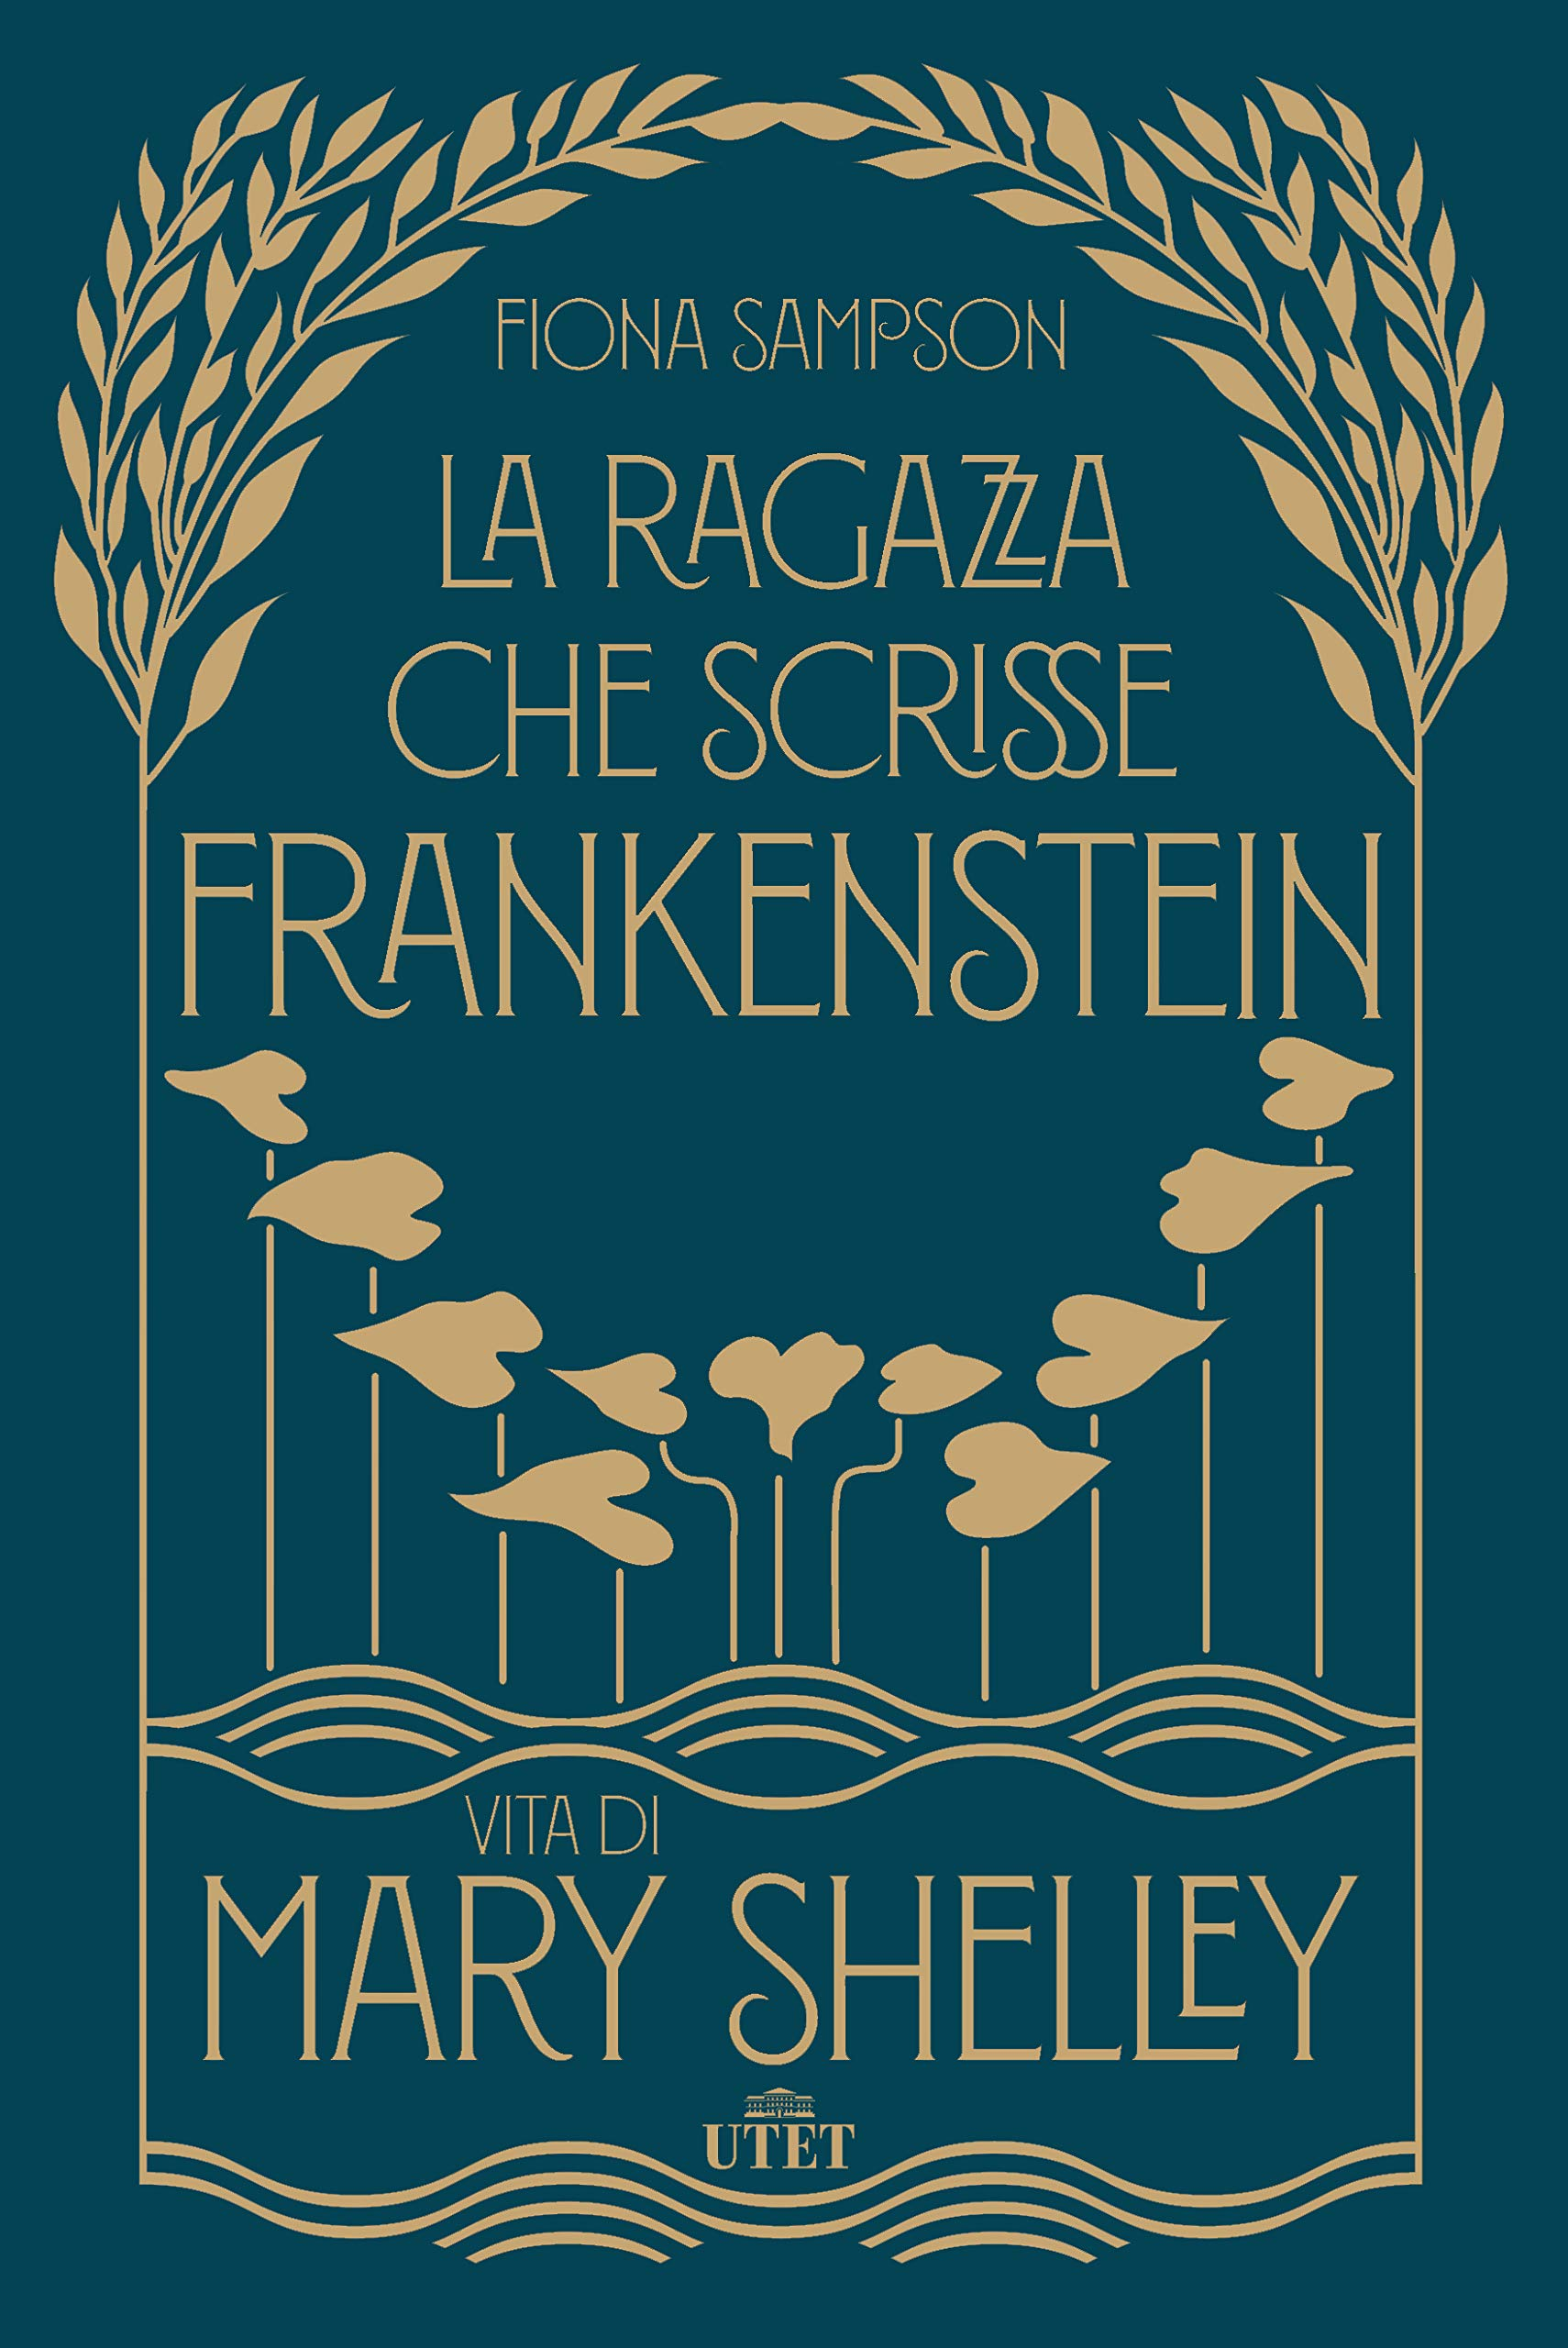 La ragazza che scrisse Frankenstein. Vita di Mary Shelley Copertina rigida – 11 set 2018 Fiona Sampson E. Gallitelli UTET 8851164401